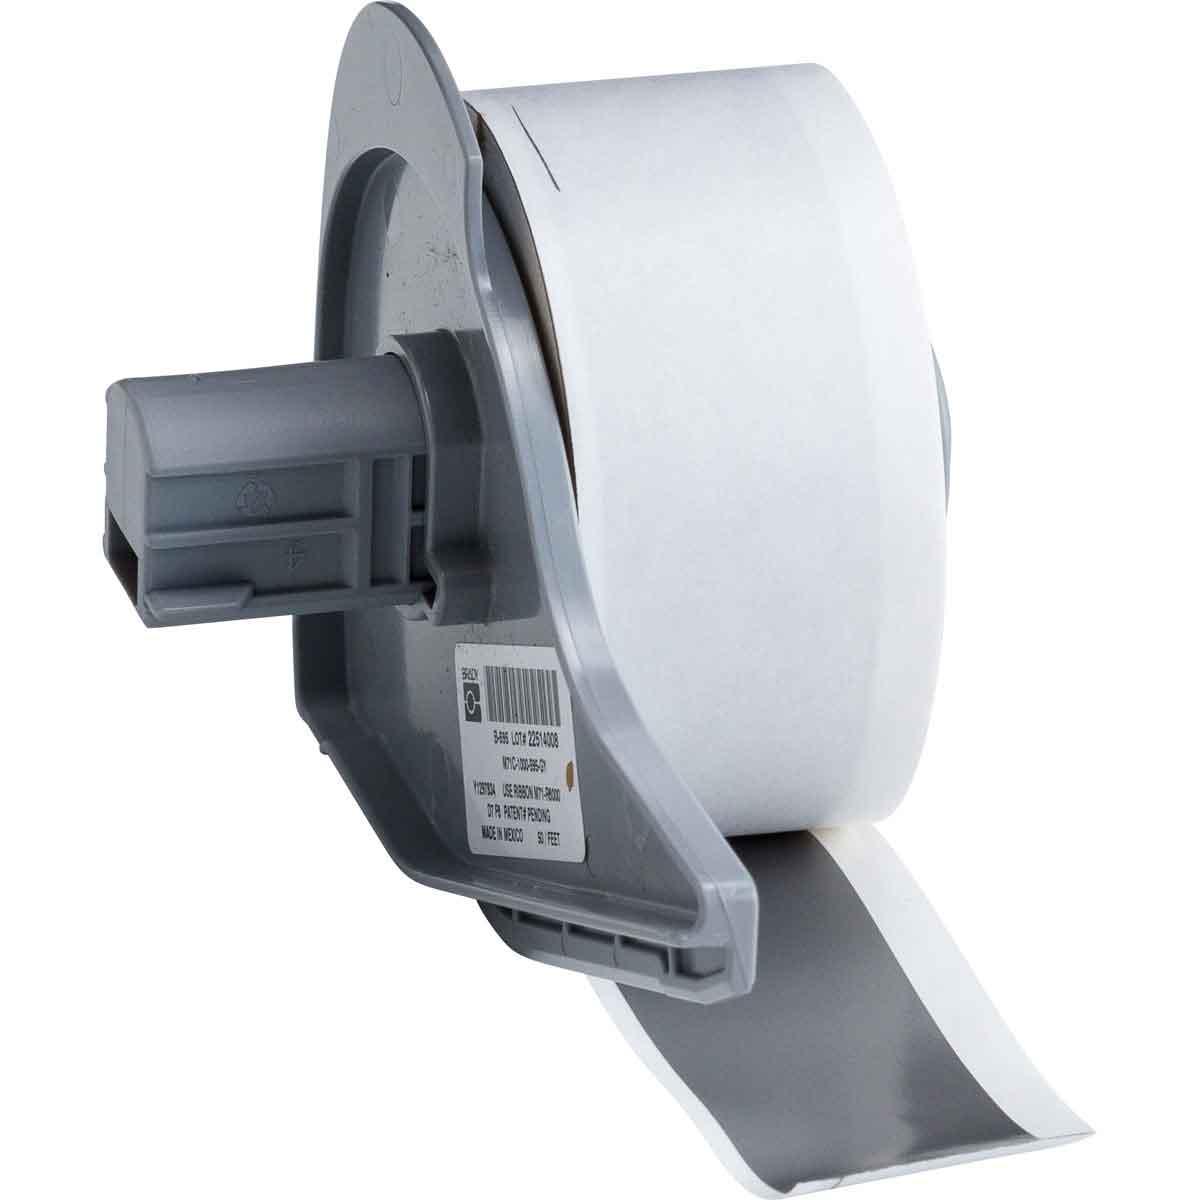 Brady® M71C-1000-595-GY Blank Thermal Transfer Tape, 50 ft L x 1 in W, Gray, B-595 Vinyl, Permanent Acrylic Adhesive, -40 to 180 deg F